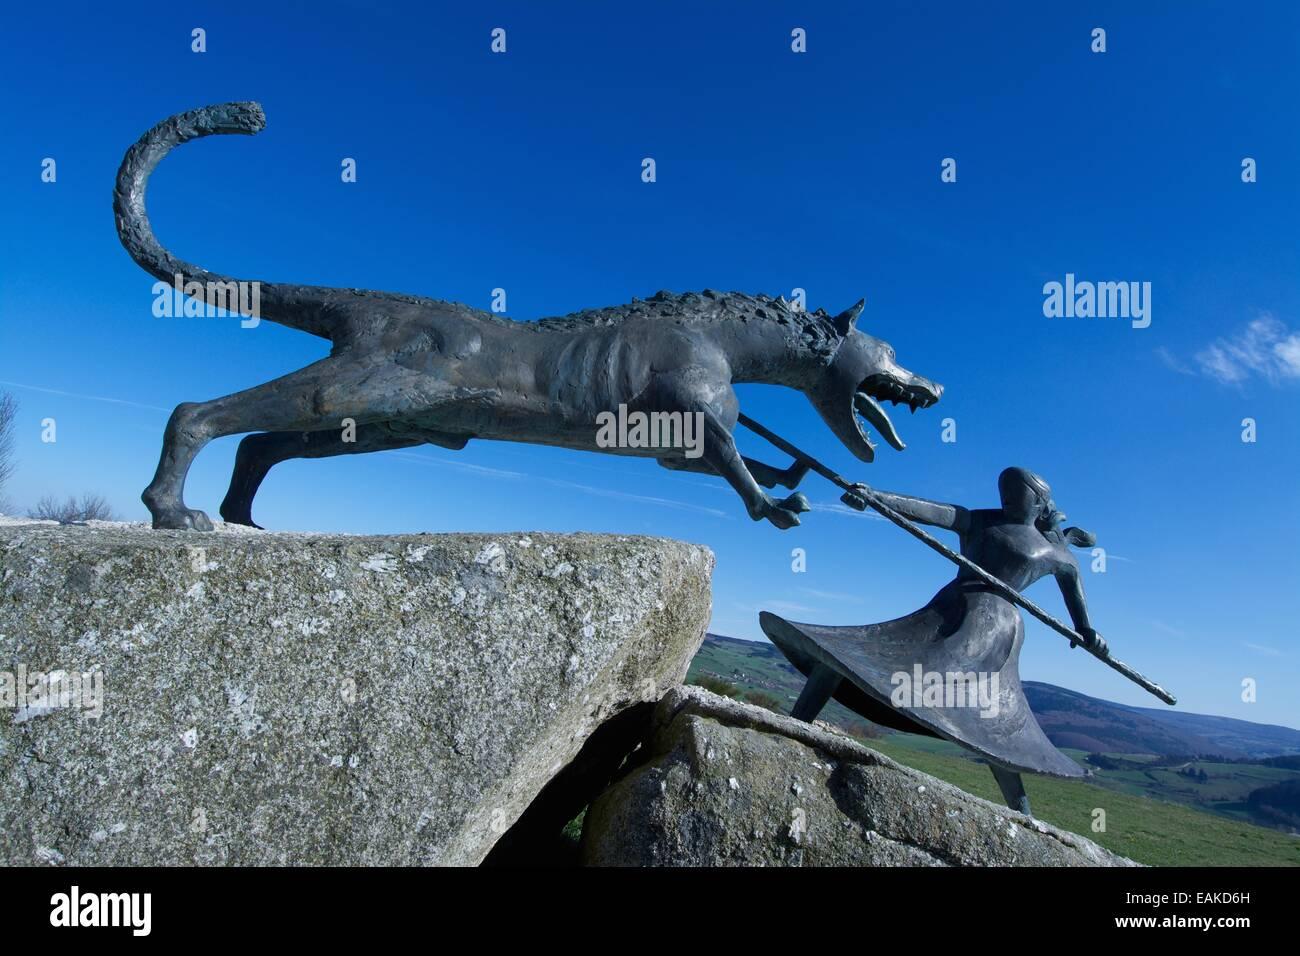 Monument of the Beast of Gevaudan, village of Auvers, Gévaudan, Margeride mountain, Haute Loire, Auvergne, France, - Stock Image